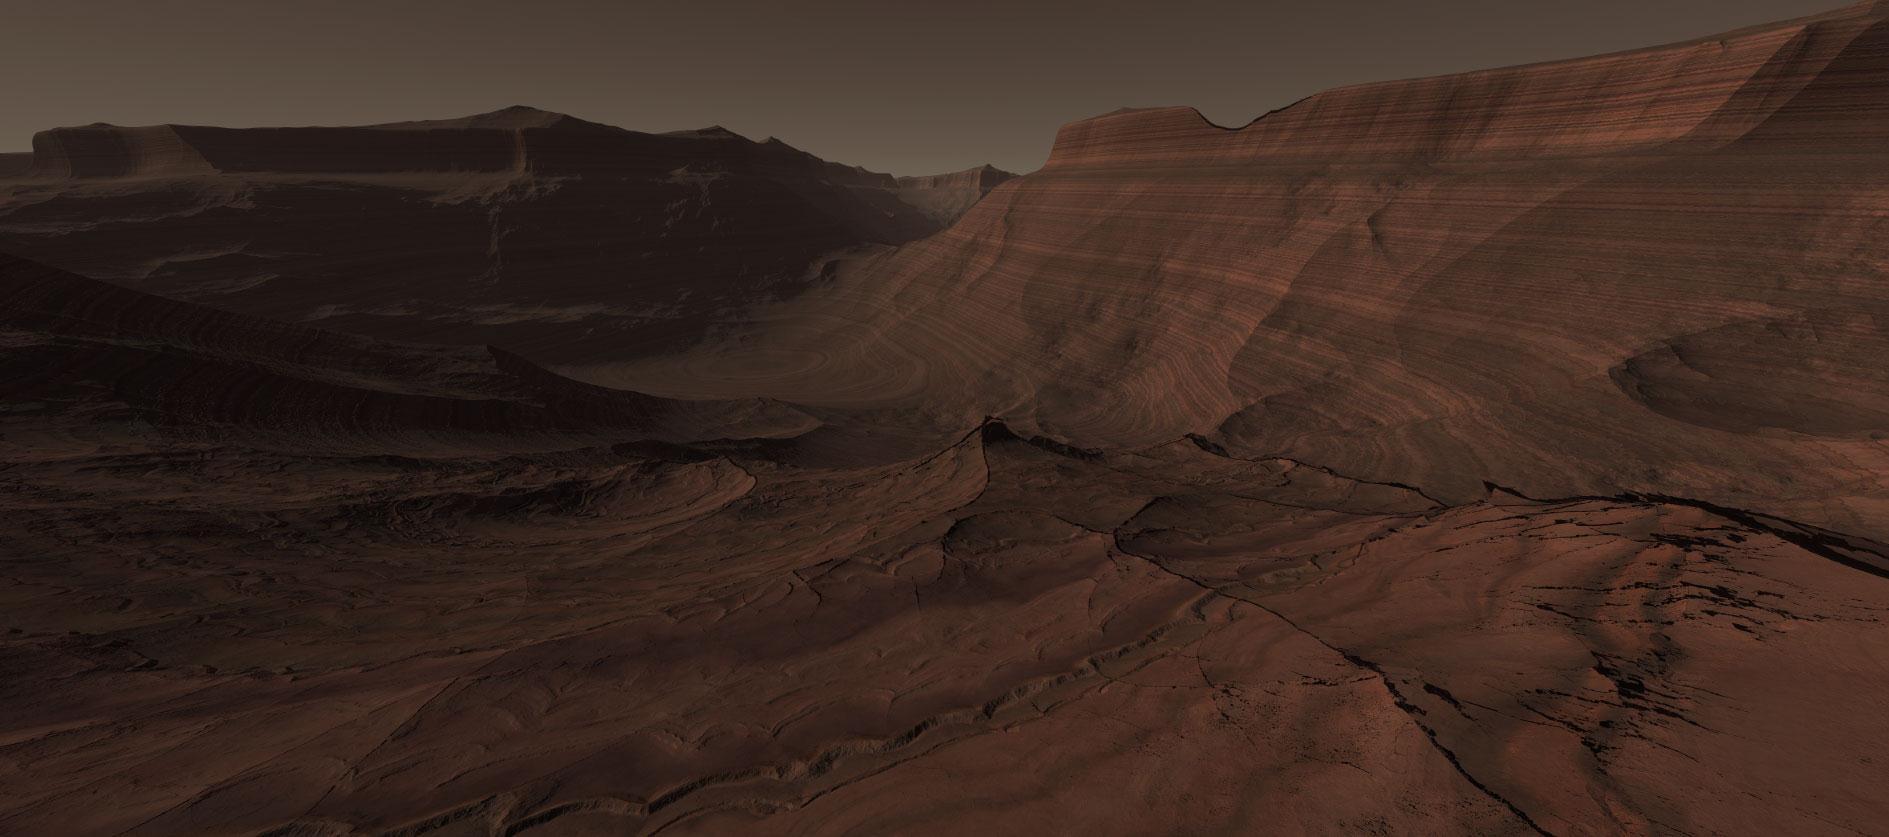 Viking Invasion of Mars Thwarted